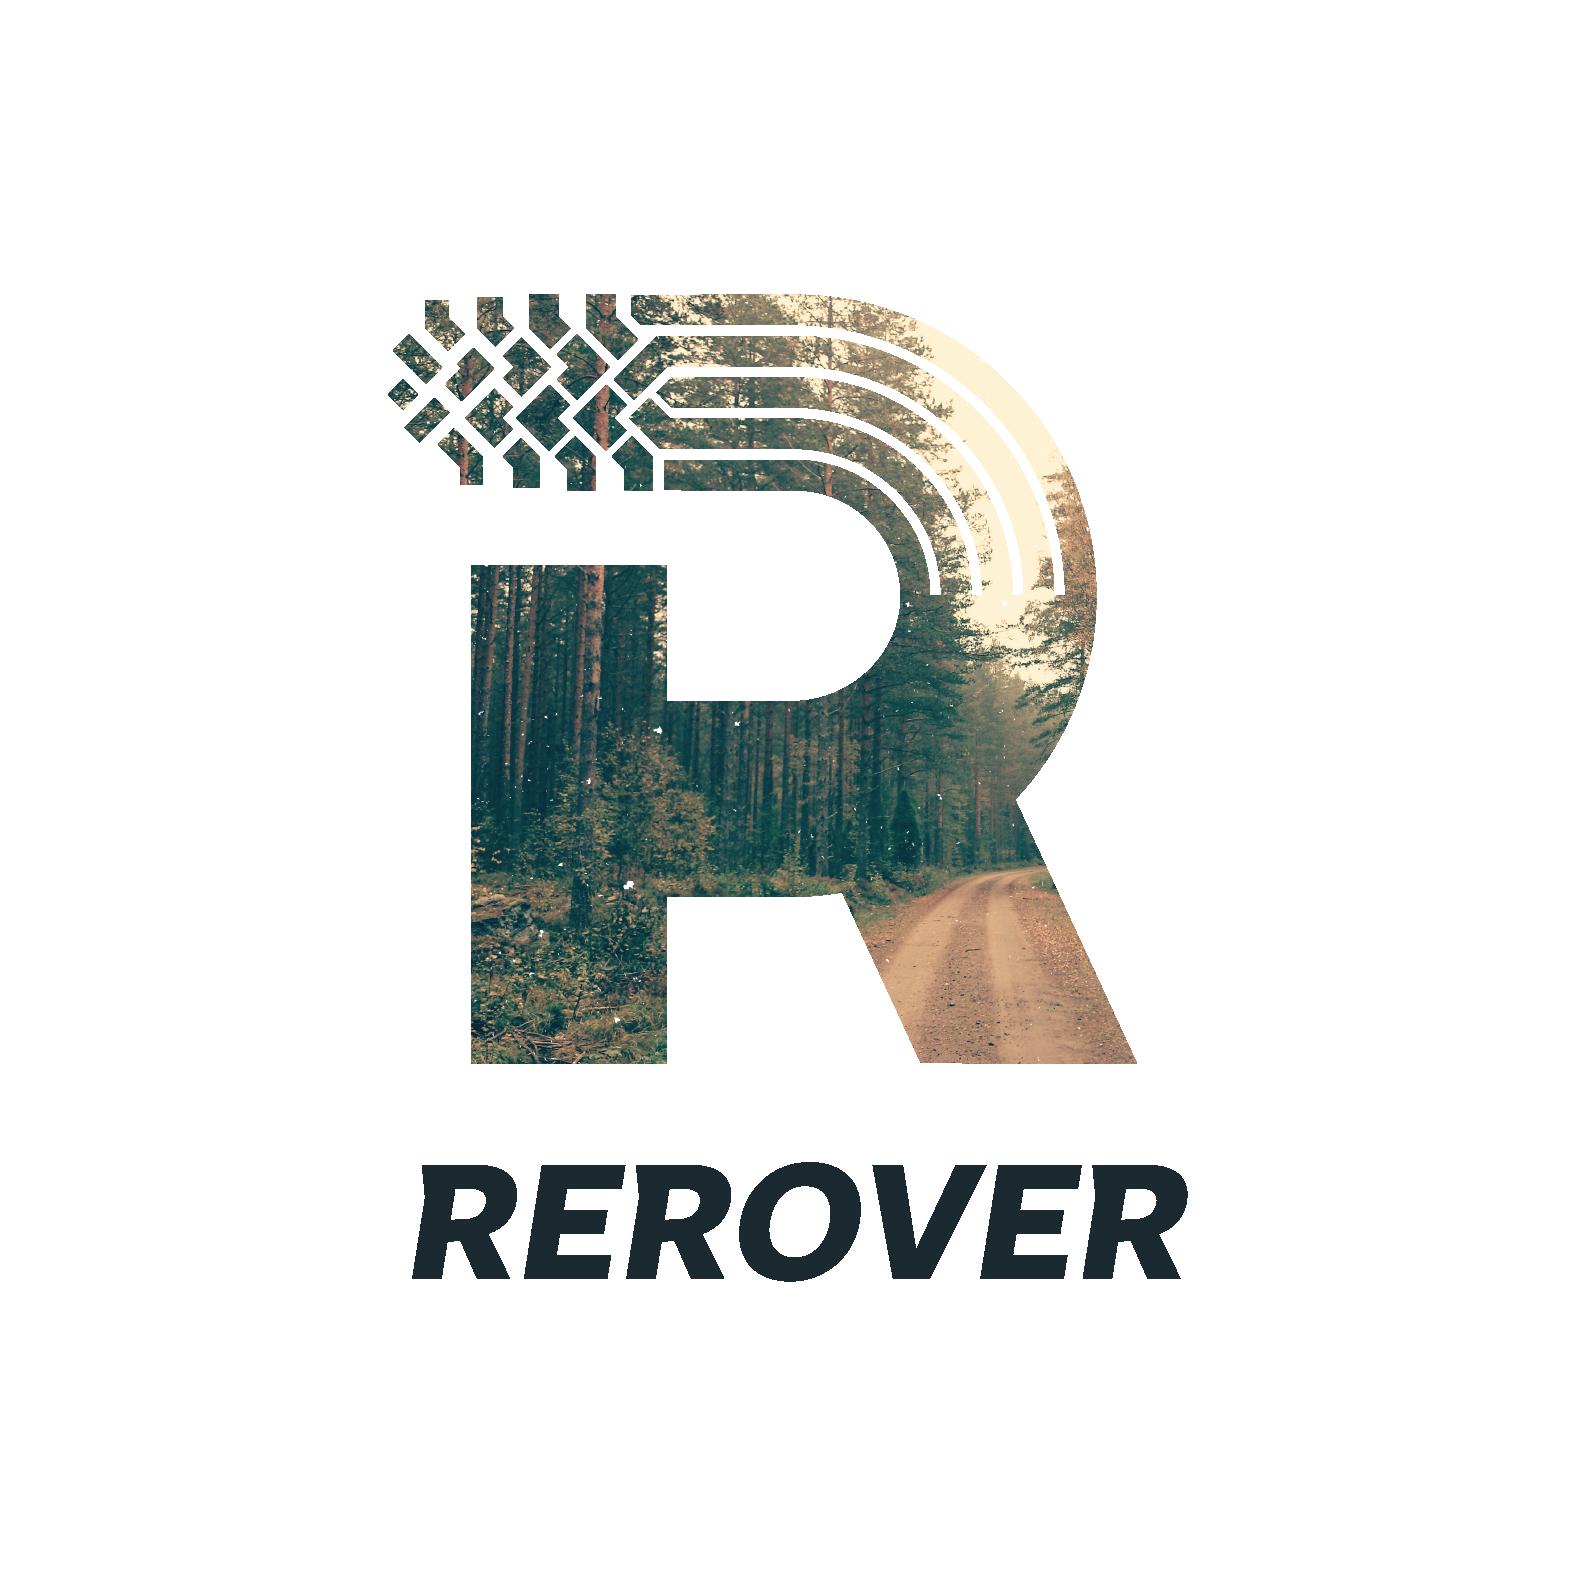 REROVER_FINAL LOGO-09.png